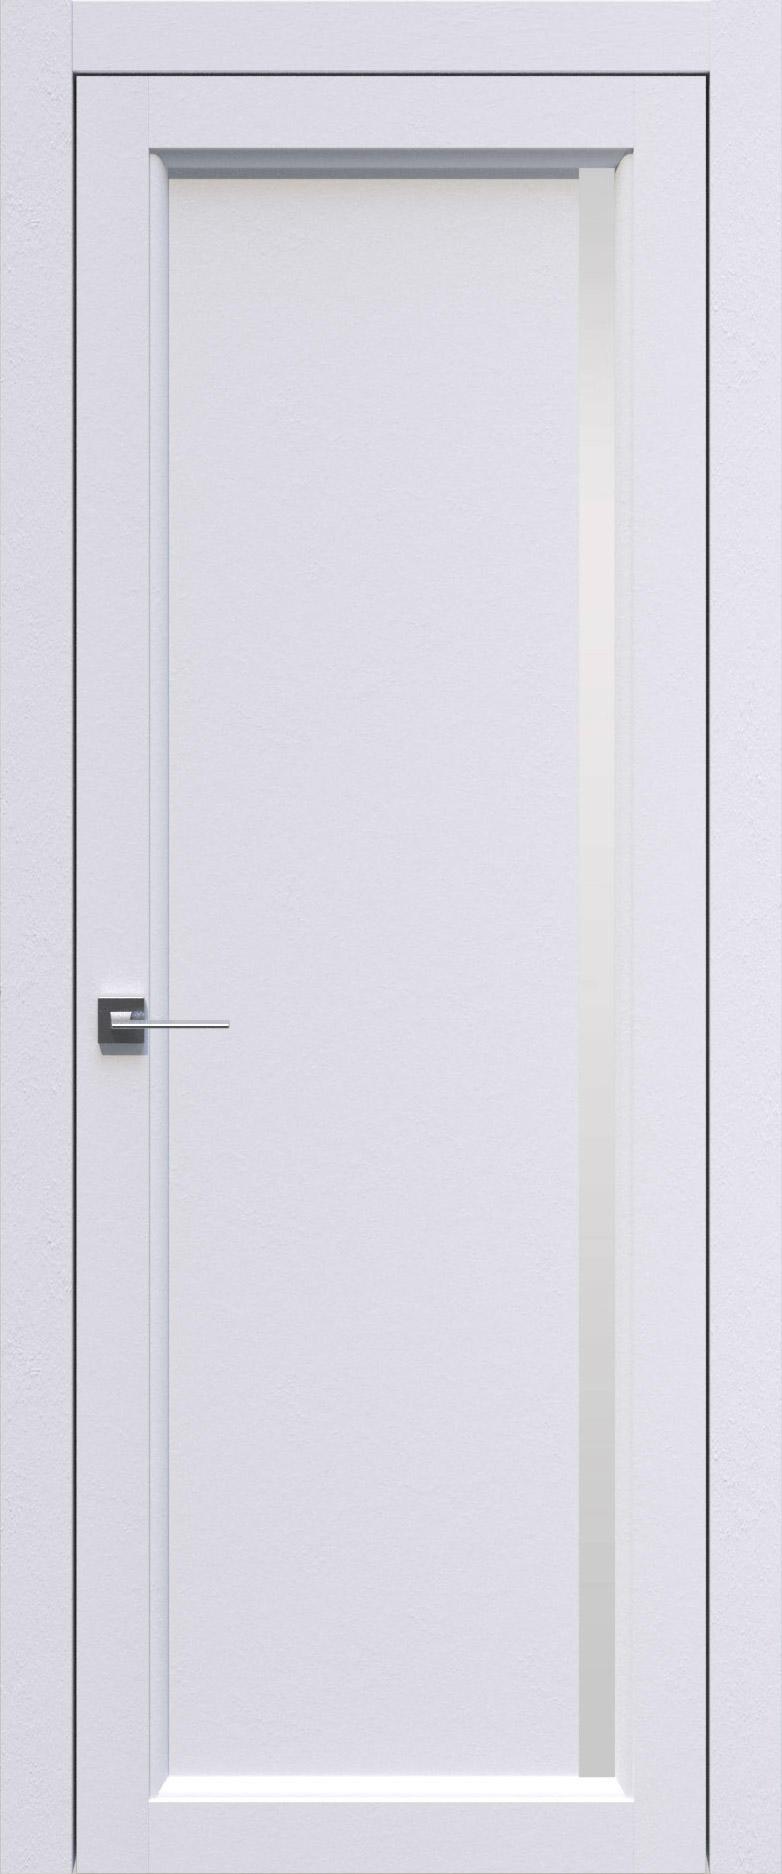 Sorrento-R З4 цвет - Арктик белый Без стекла (ДГ)